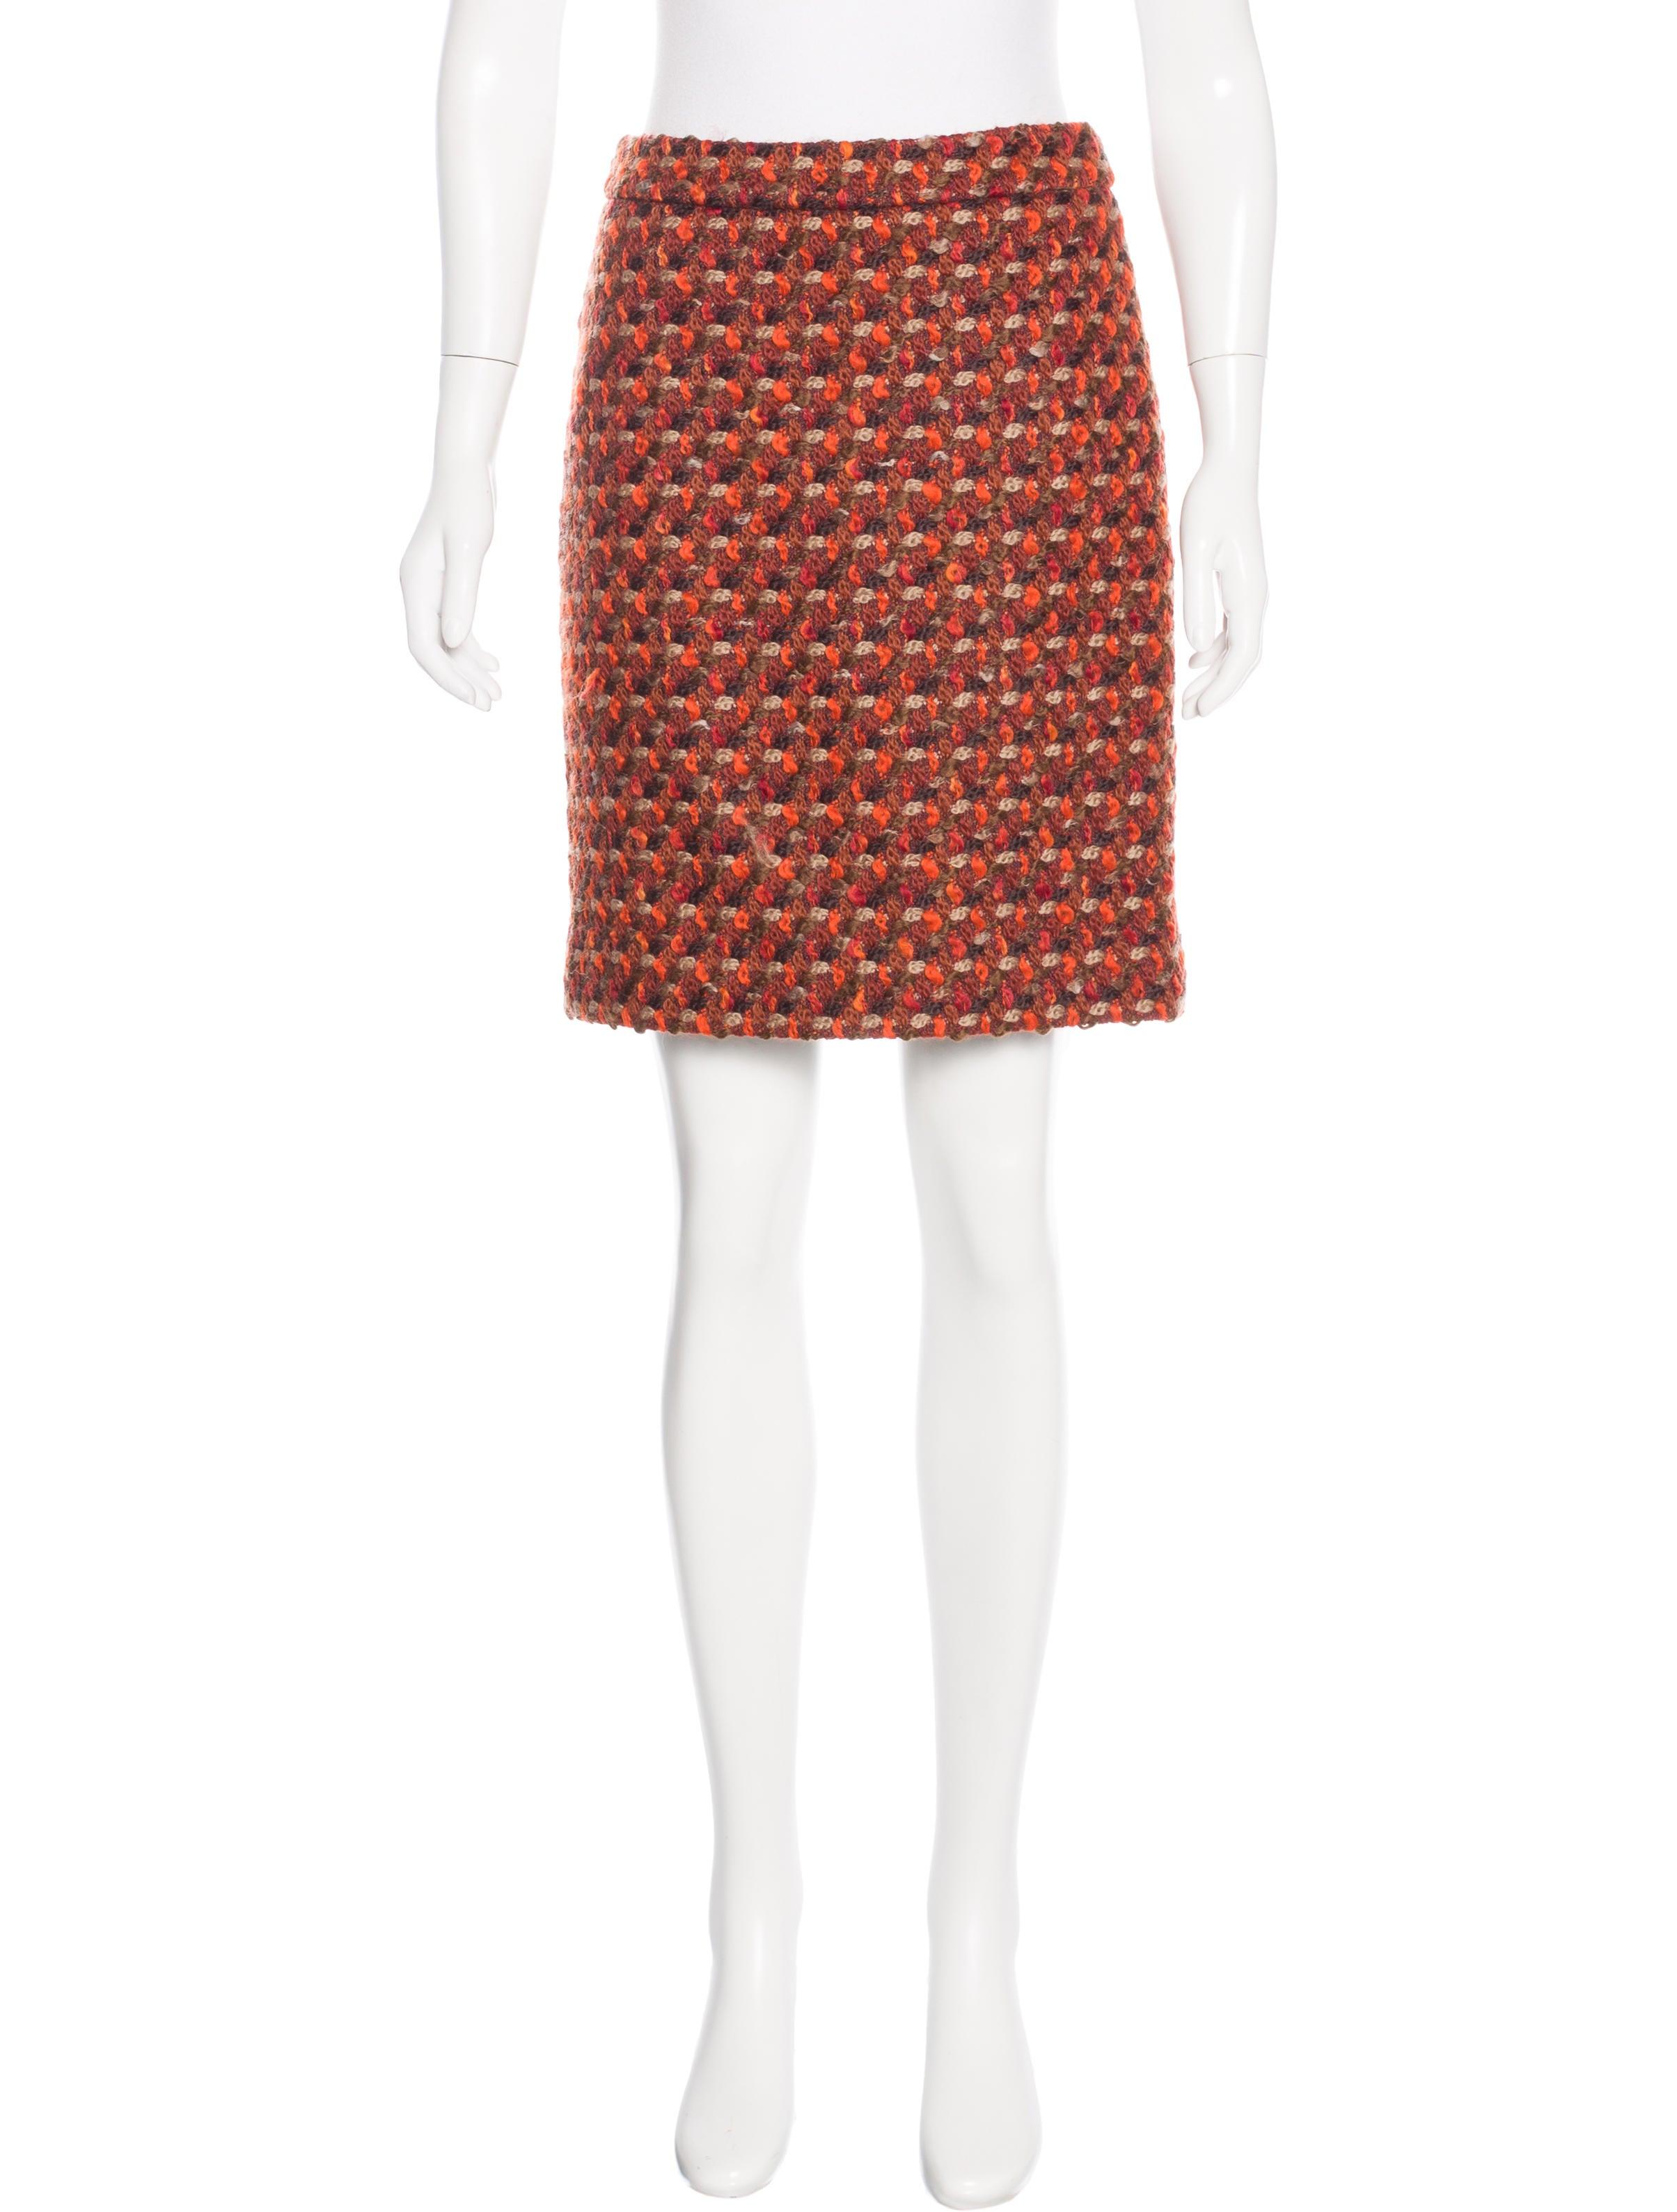 kate spade new york tweed mini skirt clothing wka55494